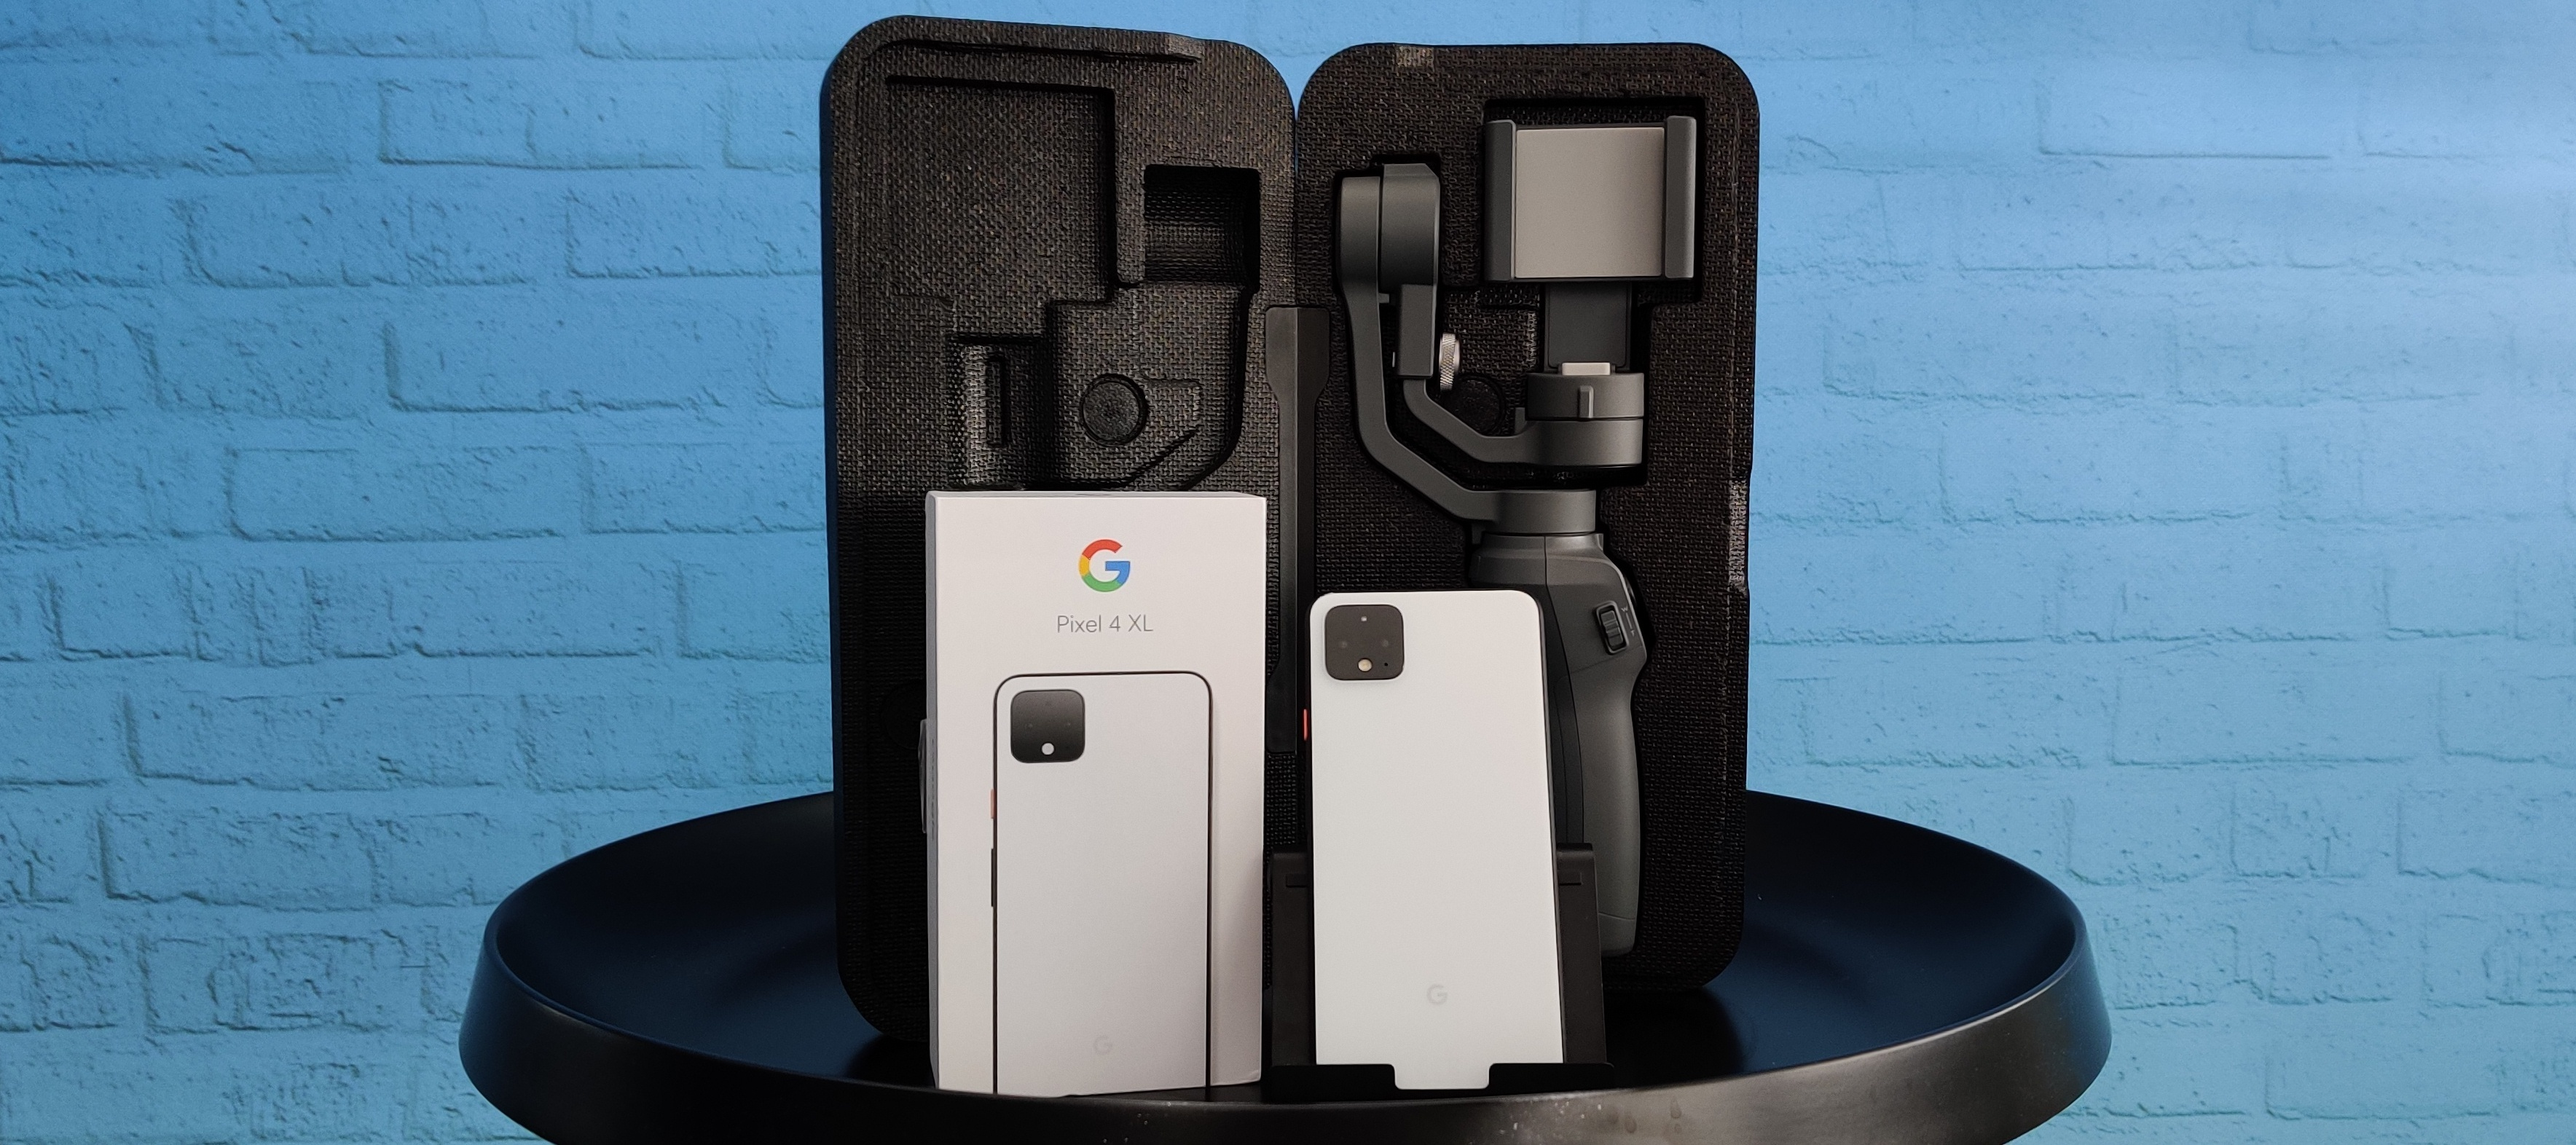 Google Pixel 4 XL inkl. DJI Osmo Mobile 2 Gimbal: Teste das abgefahrene Videobundle! Jetzt bewerben!